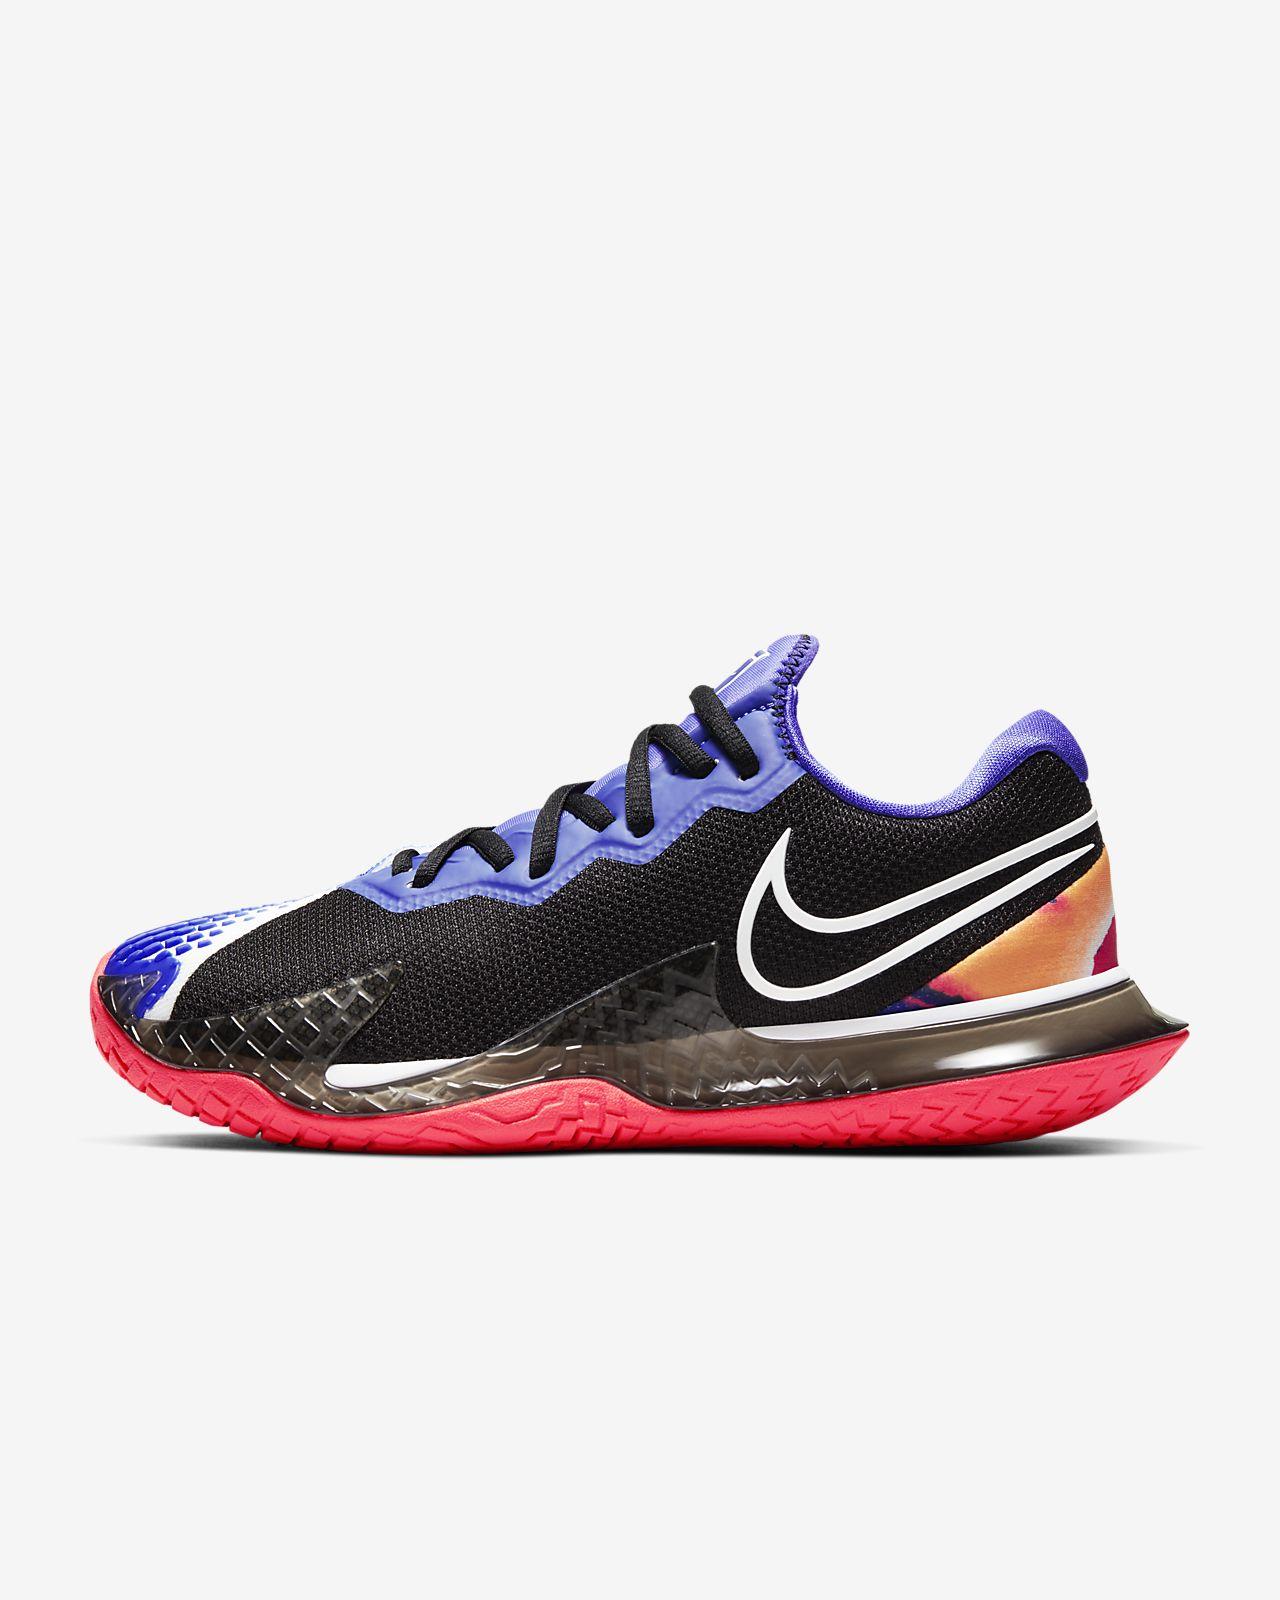 rafa nadal tennis shoes | Sneakers nike, Tennis shoes, Nike